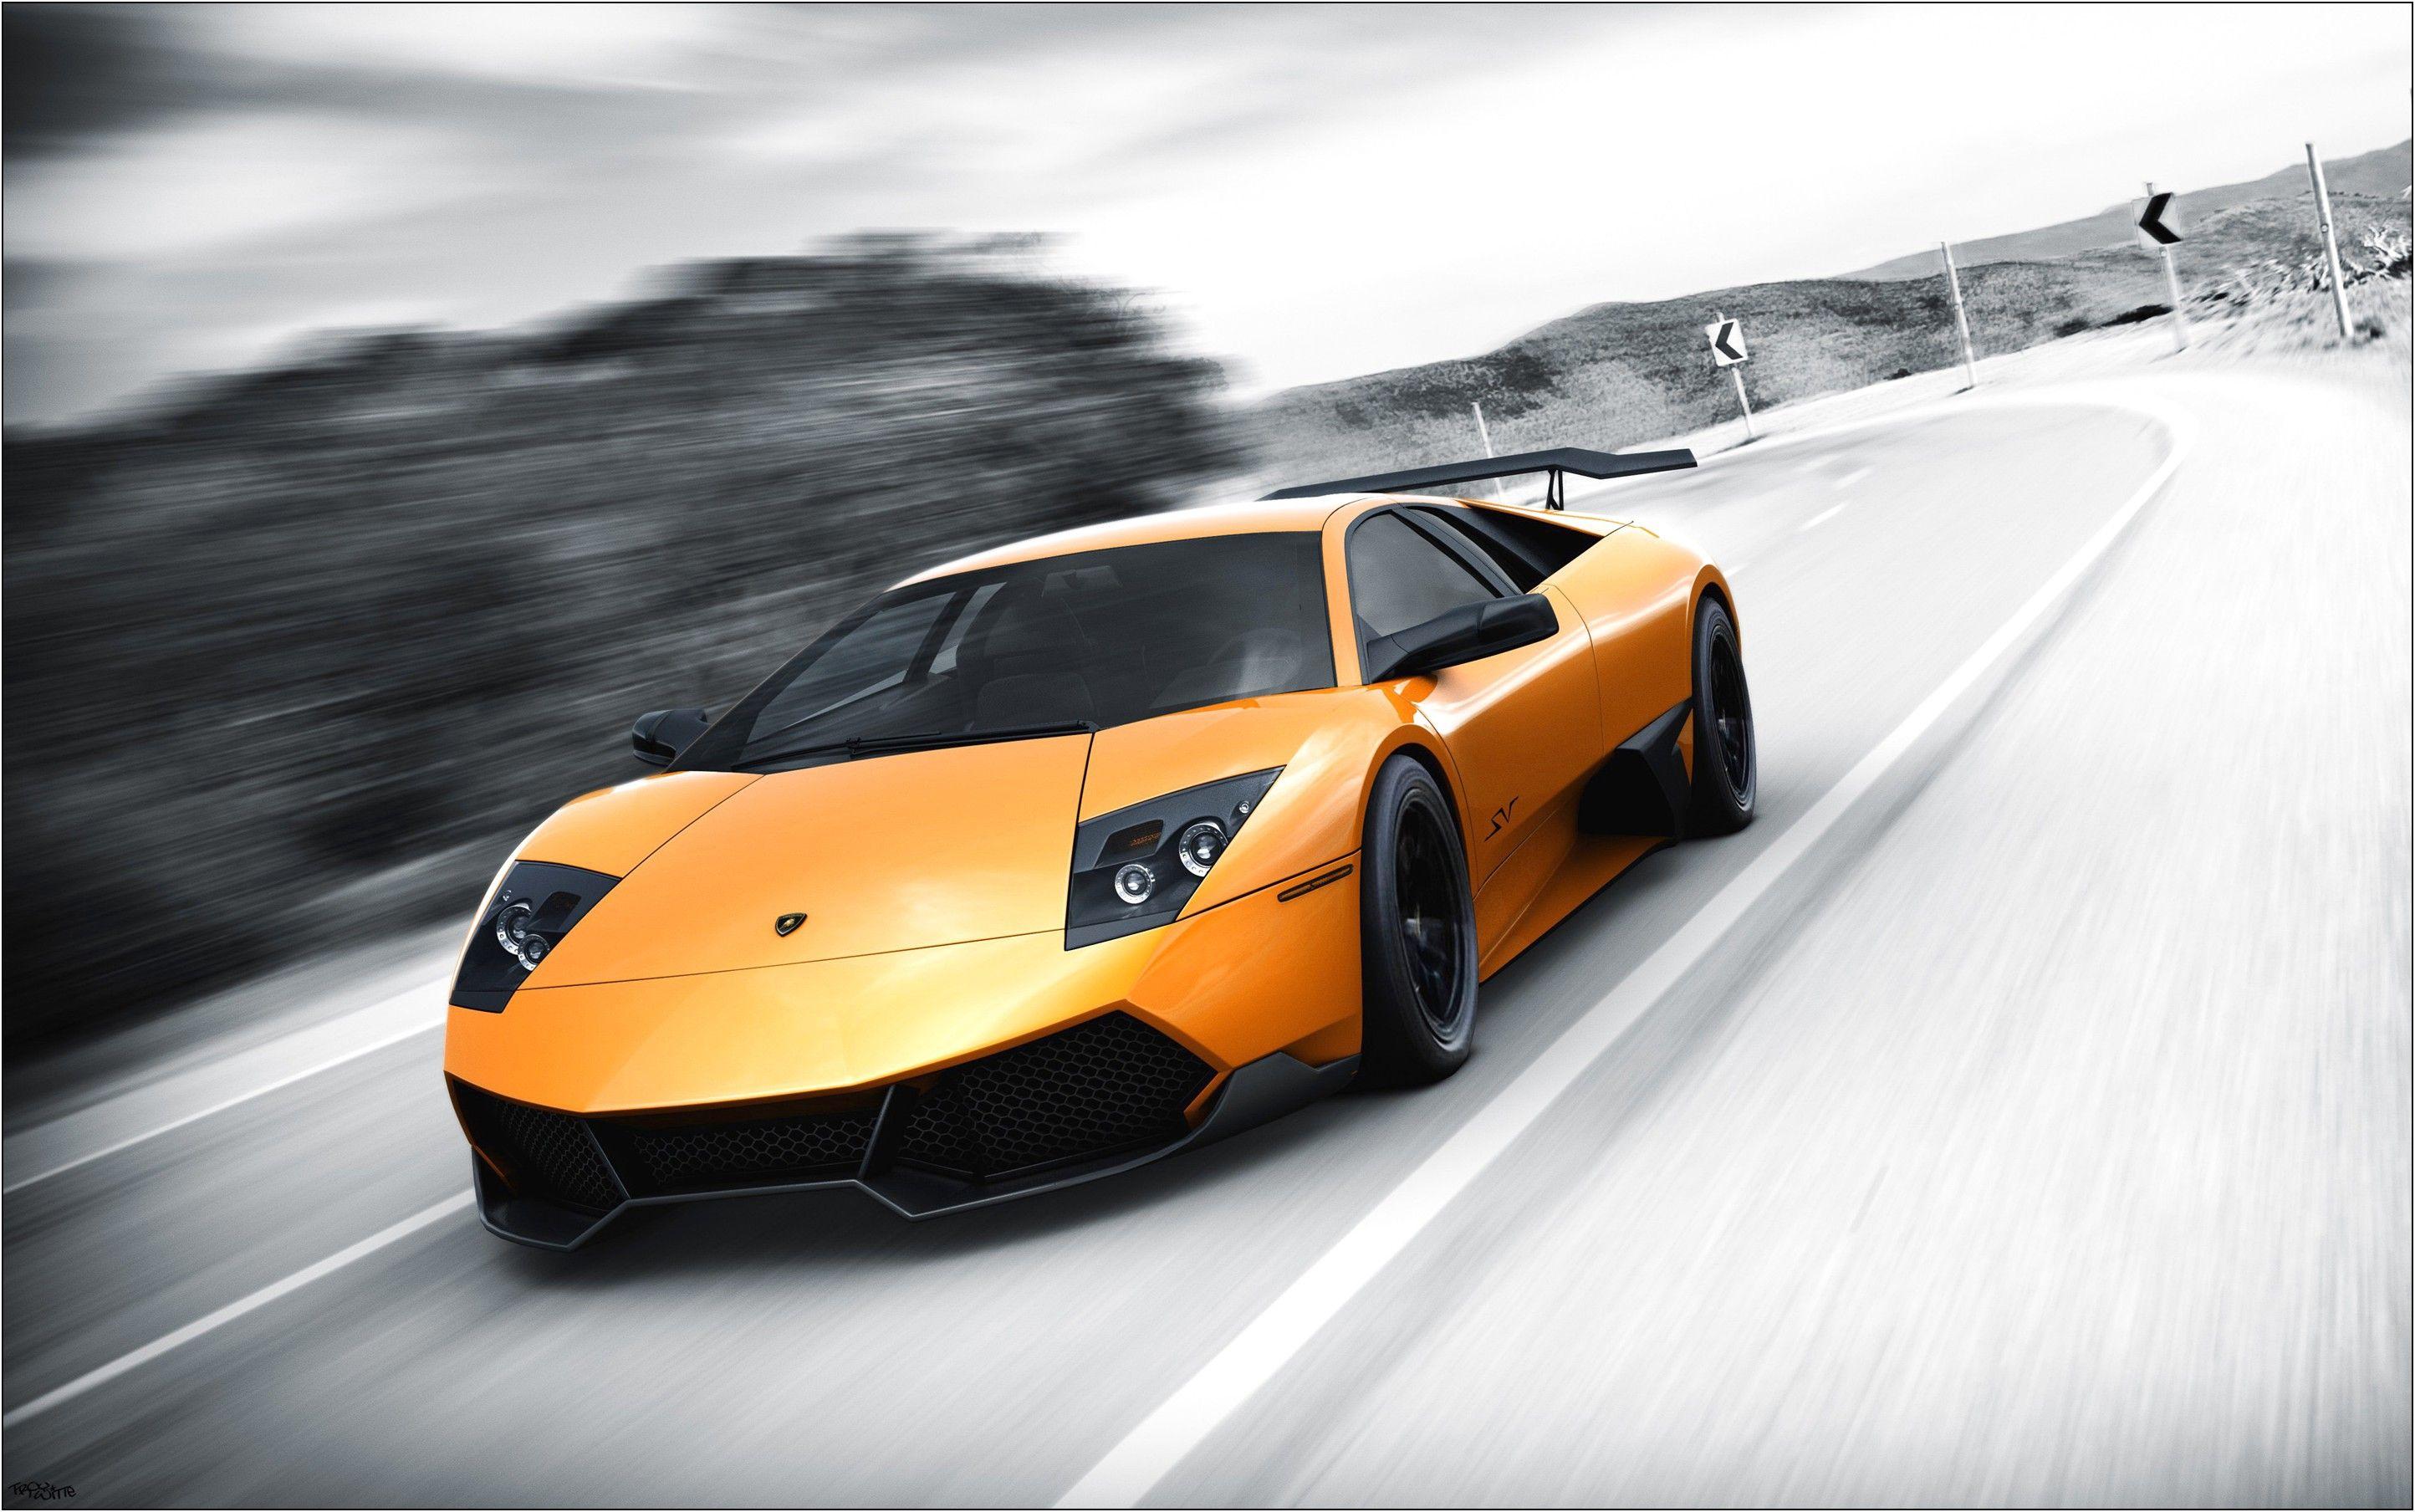 Lamborghini car wallpaper for nokia 5233 https www twitter com